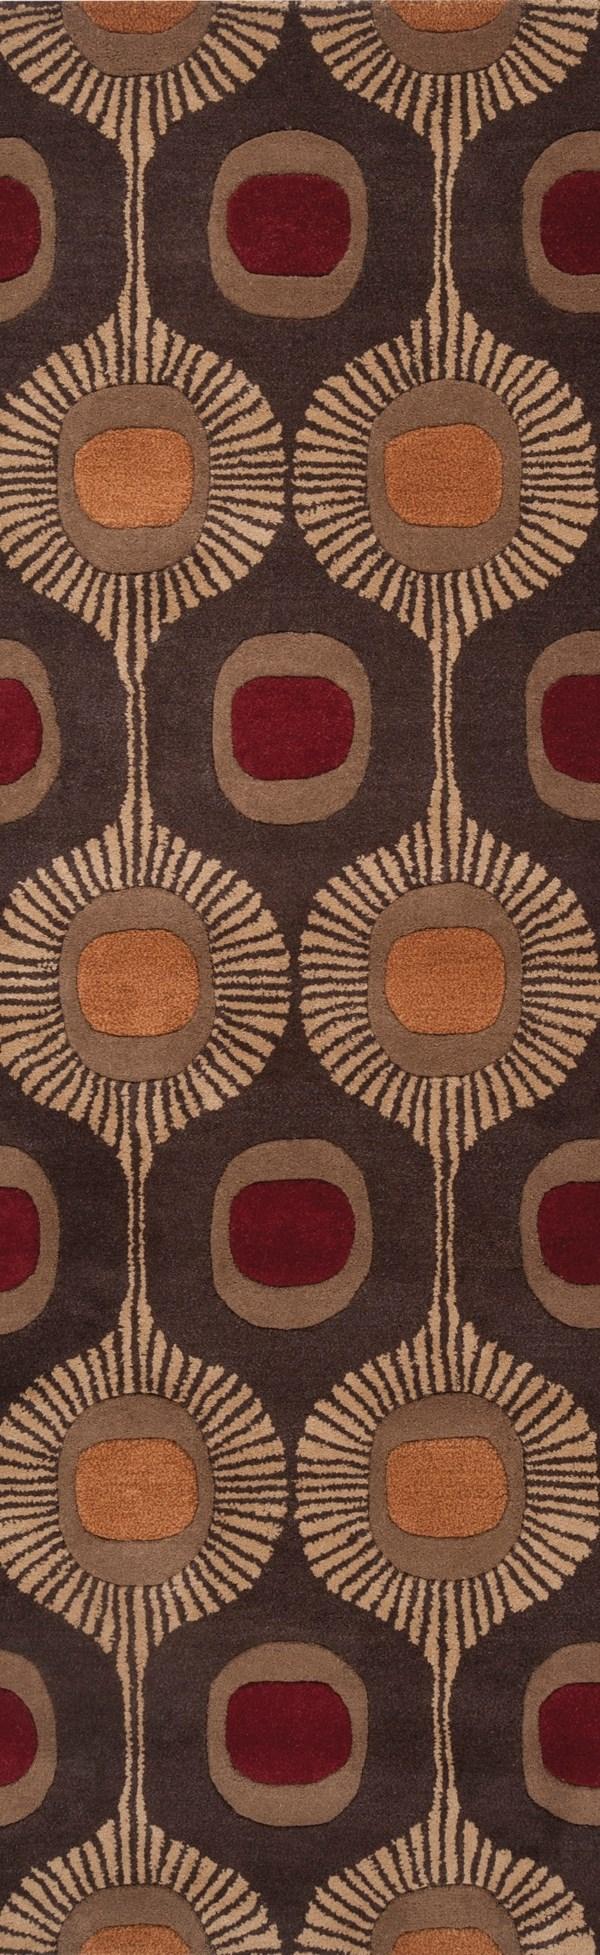 Dark Brown, Peanut Butter, Auburn Contemporary / Modern Area Rug